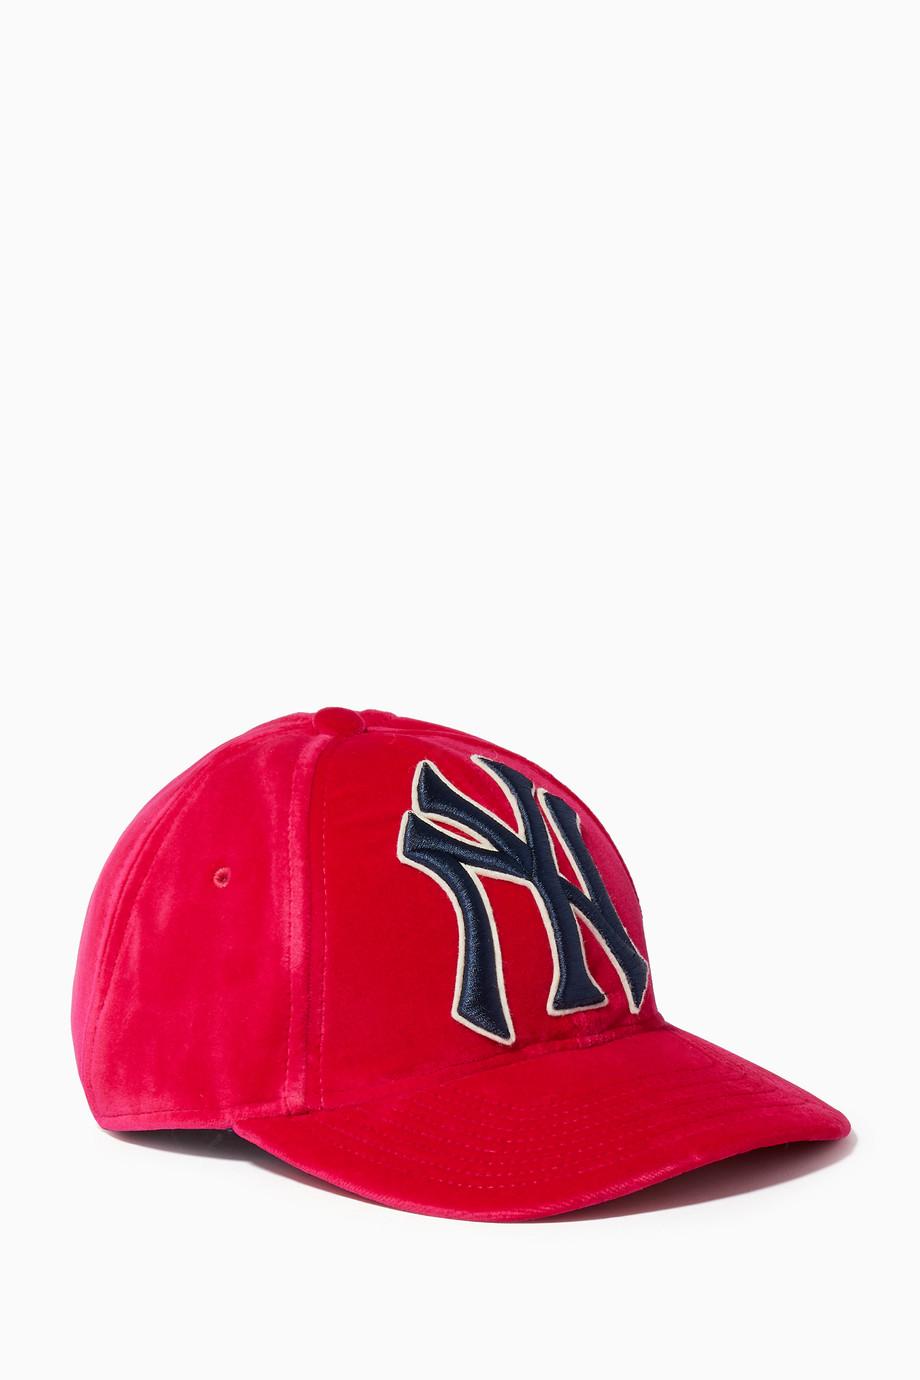 dc47edace741d Shop Gucci Pink Fuchsia NY Yankees™ Baseball Hat for Women